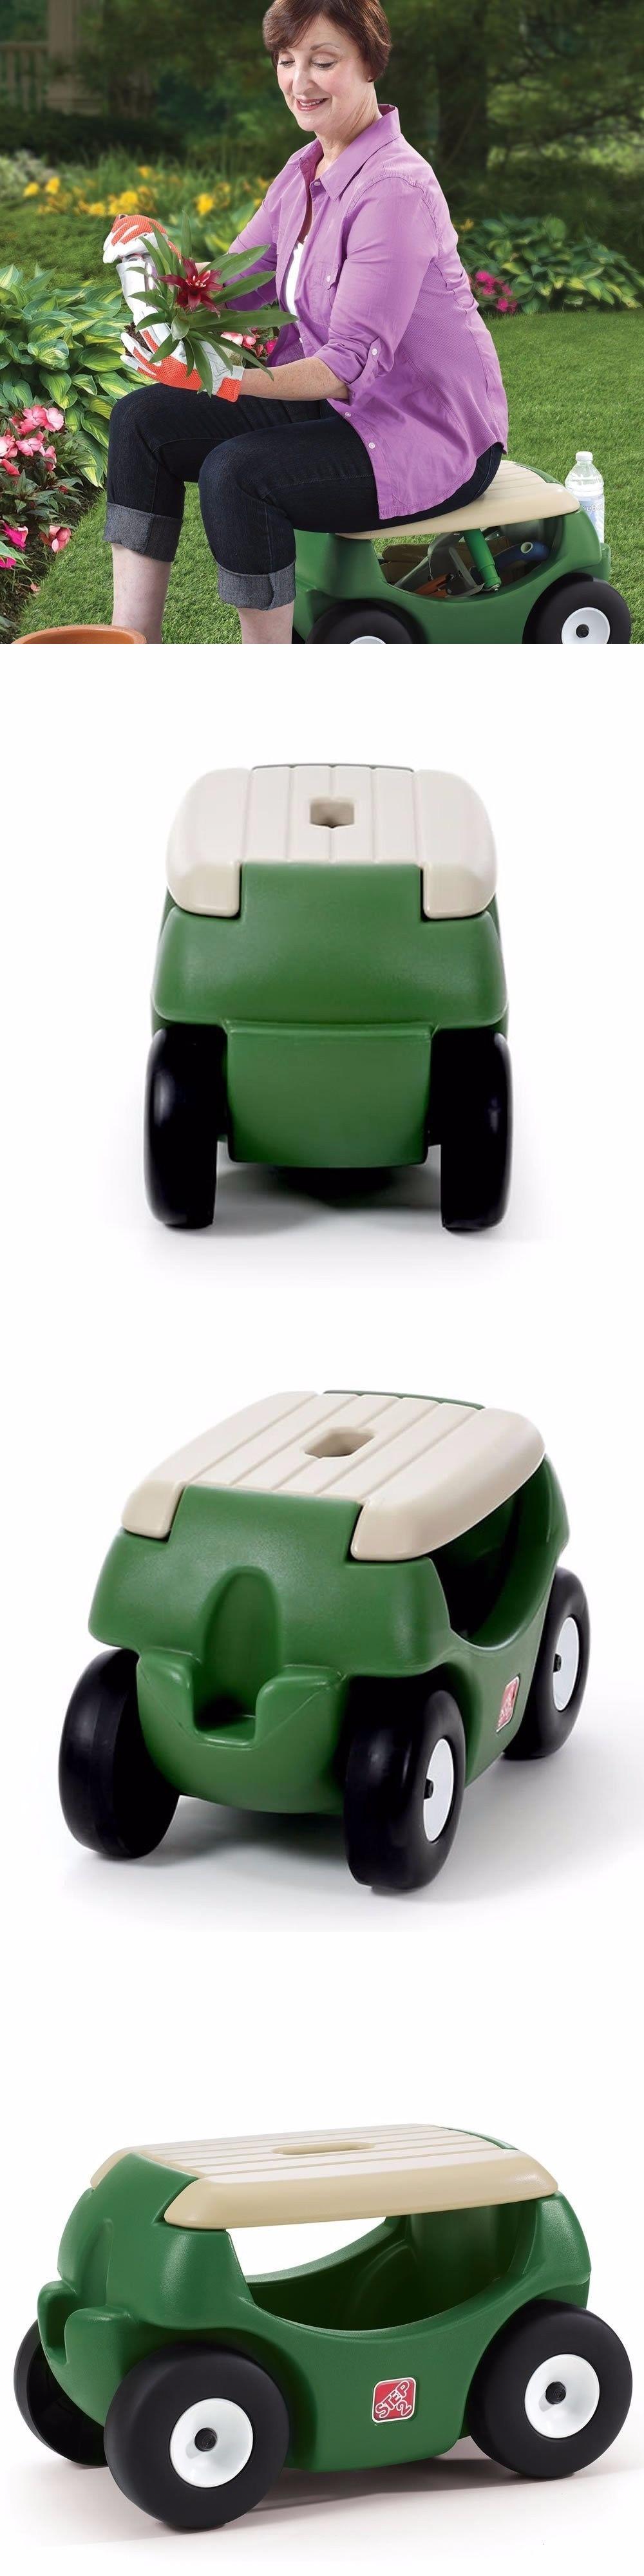 Garden Kneelers Pads And Seats 75669: Garden Hopper Seat With Wheels    Heavy Duty Rolling · ScootersWheels